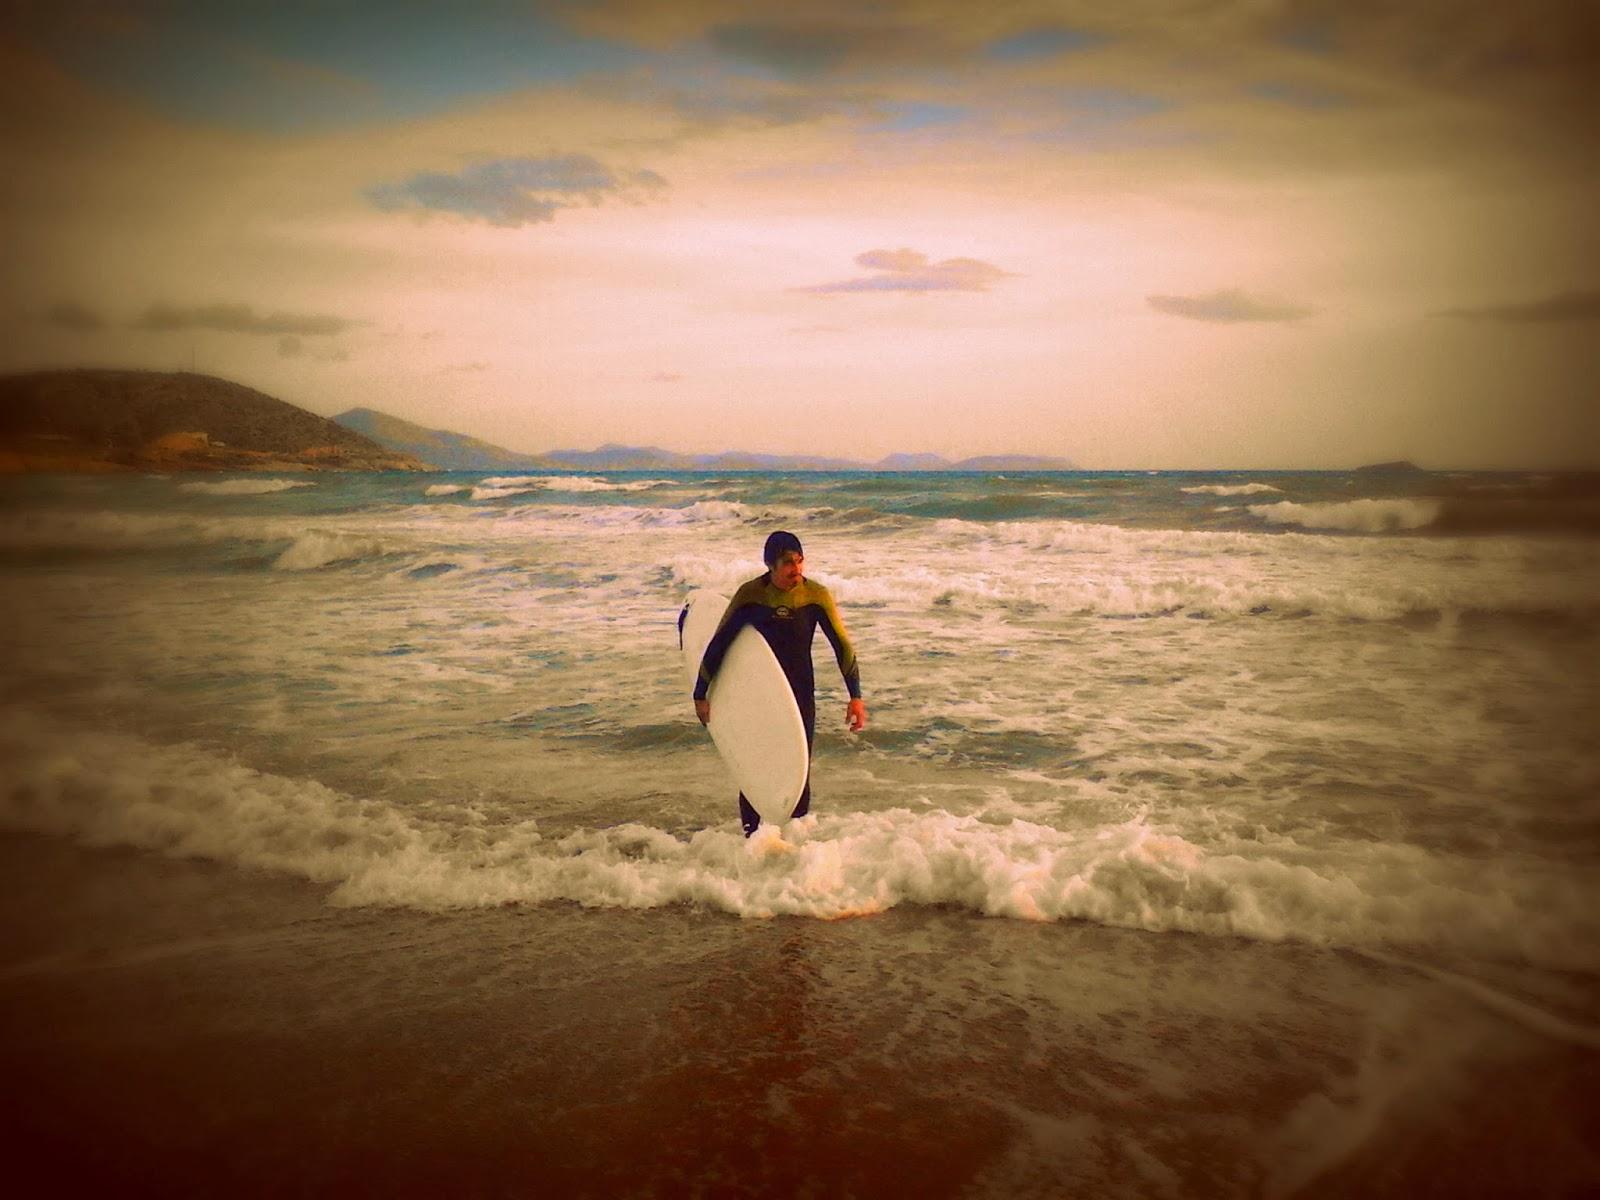 Longboard Surfing Wallpaper PicsWallpapercom 1600x1200